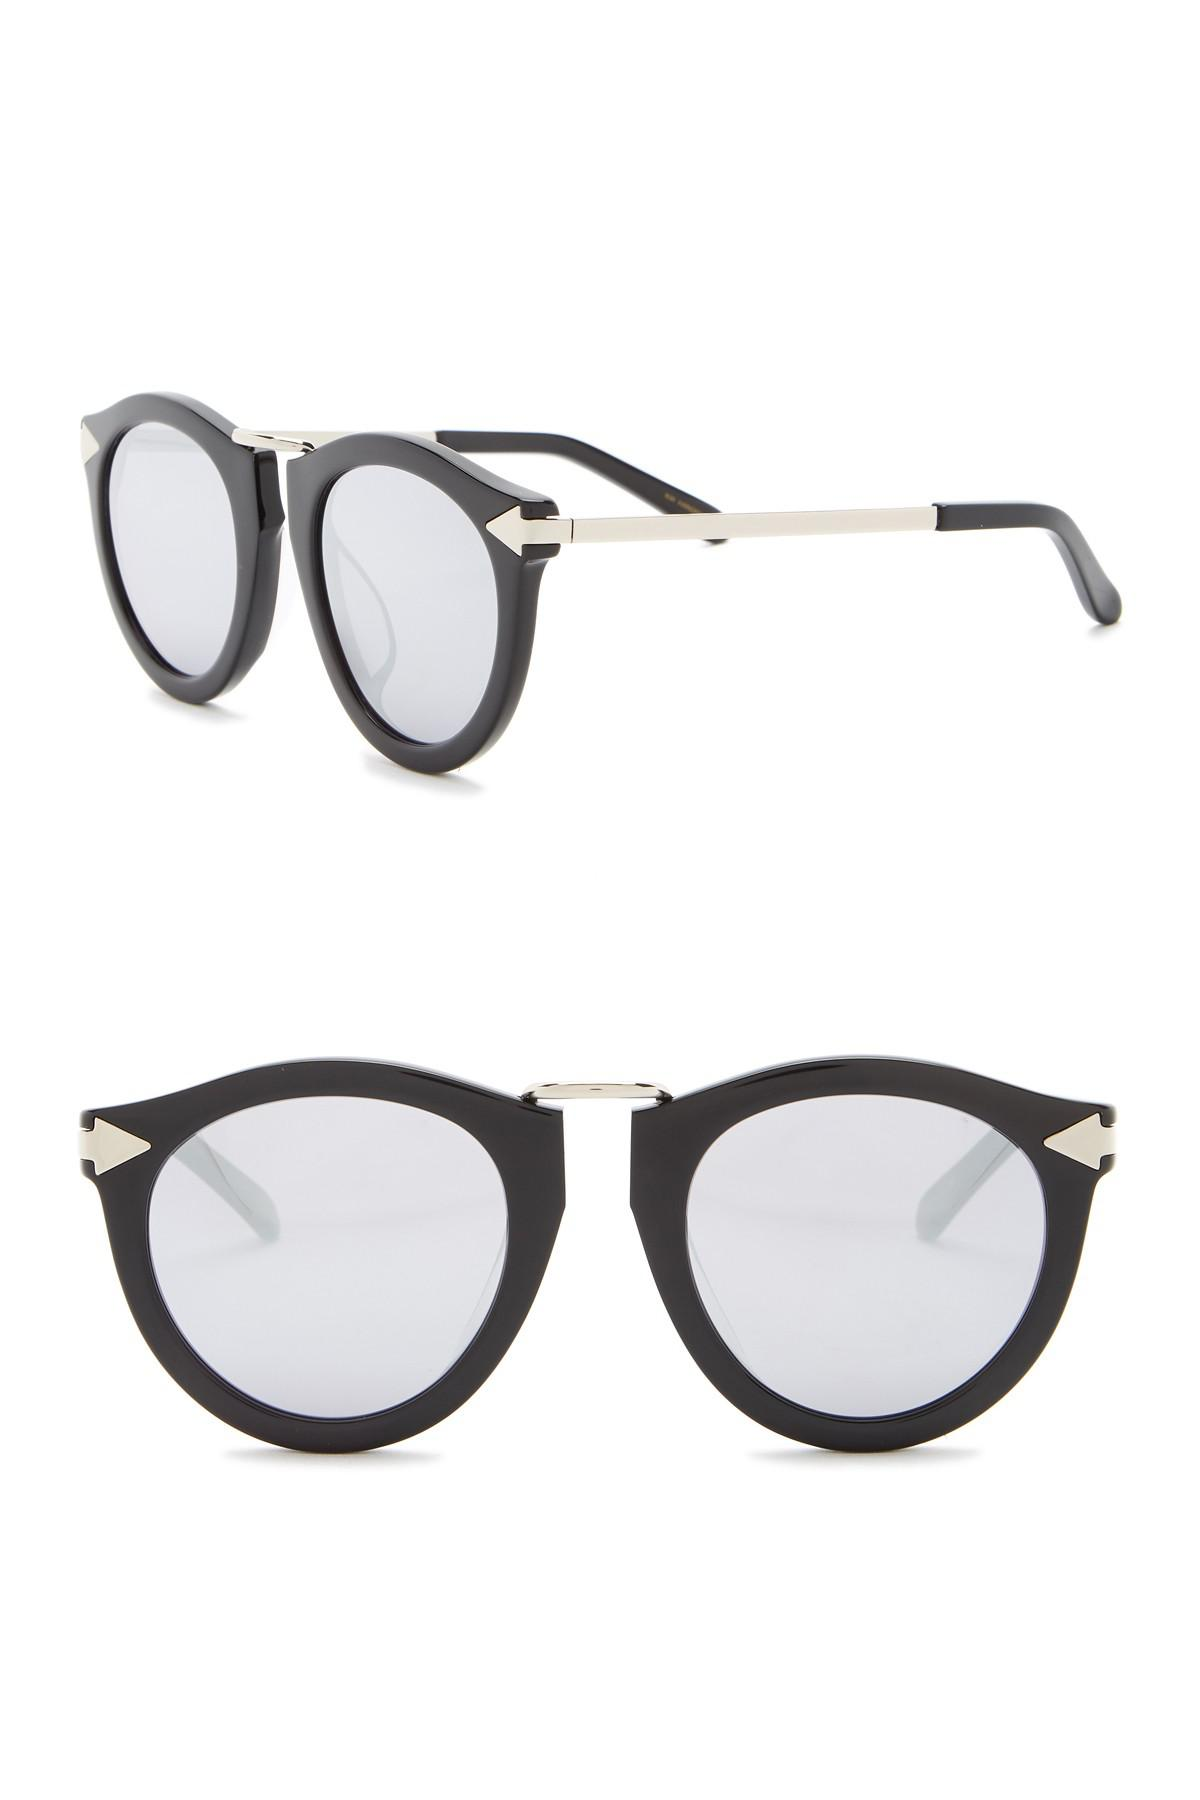 b67d7f0fddea Lyst - Karen Walker Harvest Superstars 58mm Round Sunglasses in Metallic